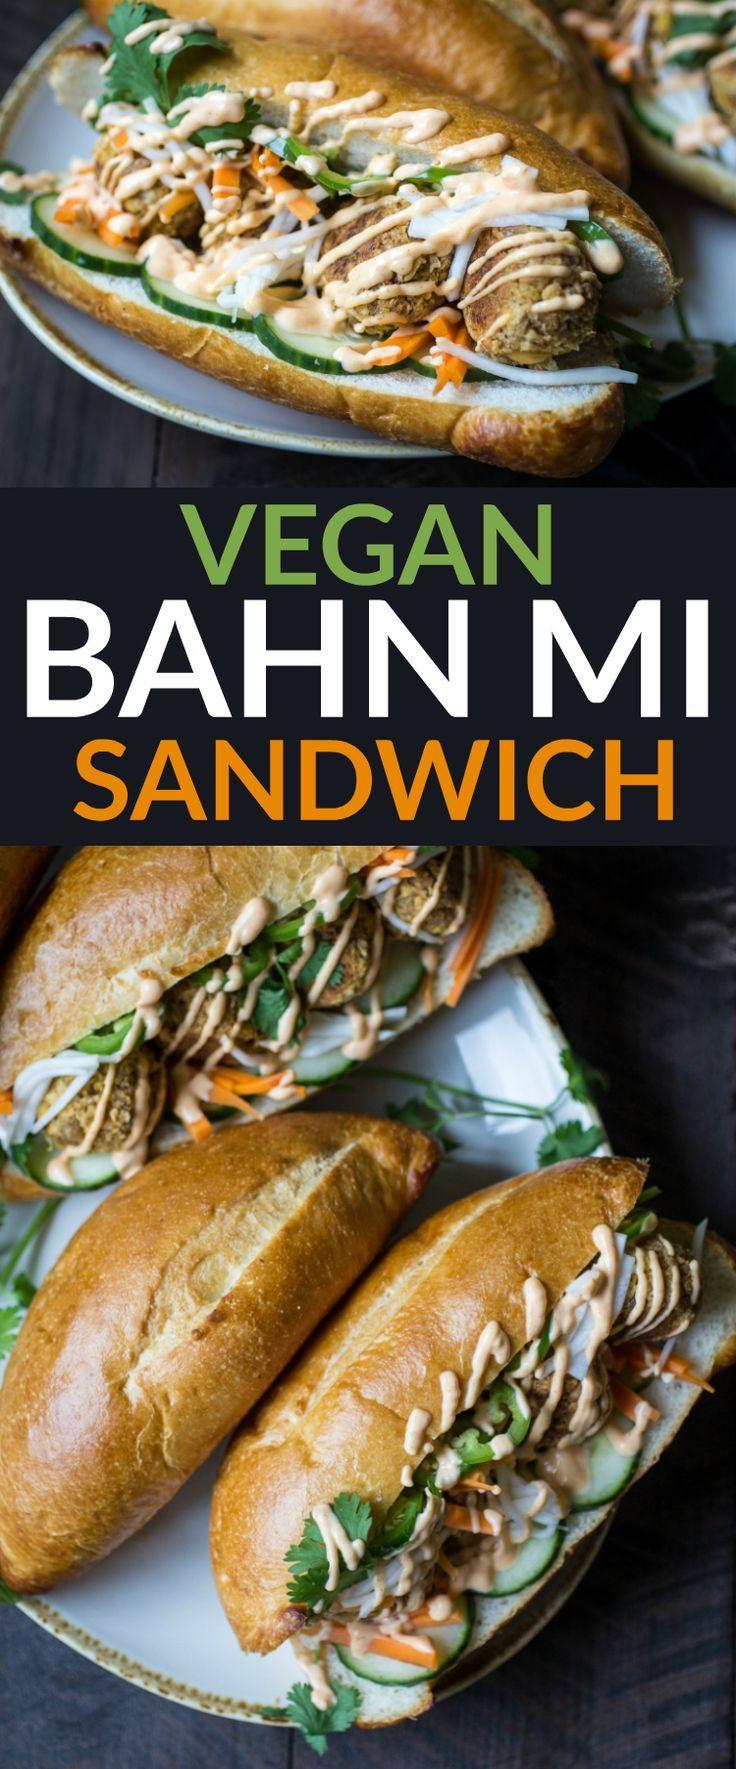 Food Recipe Vegan Meatball Bahn Mi The Wanderlust Kitchen Flashmode Arabia مقالات تعليمية مجانية معلومات ثقافية عامة موسوعة شاملة